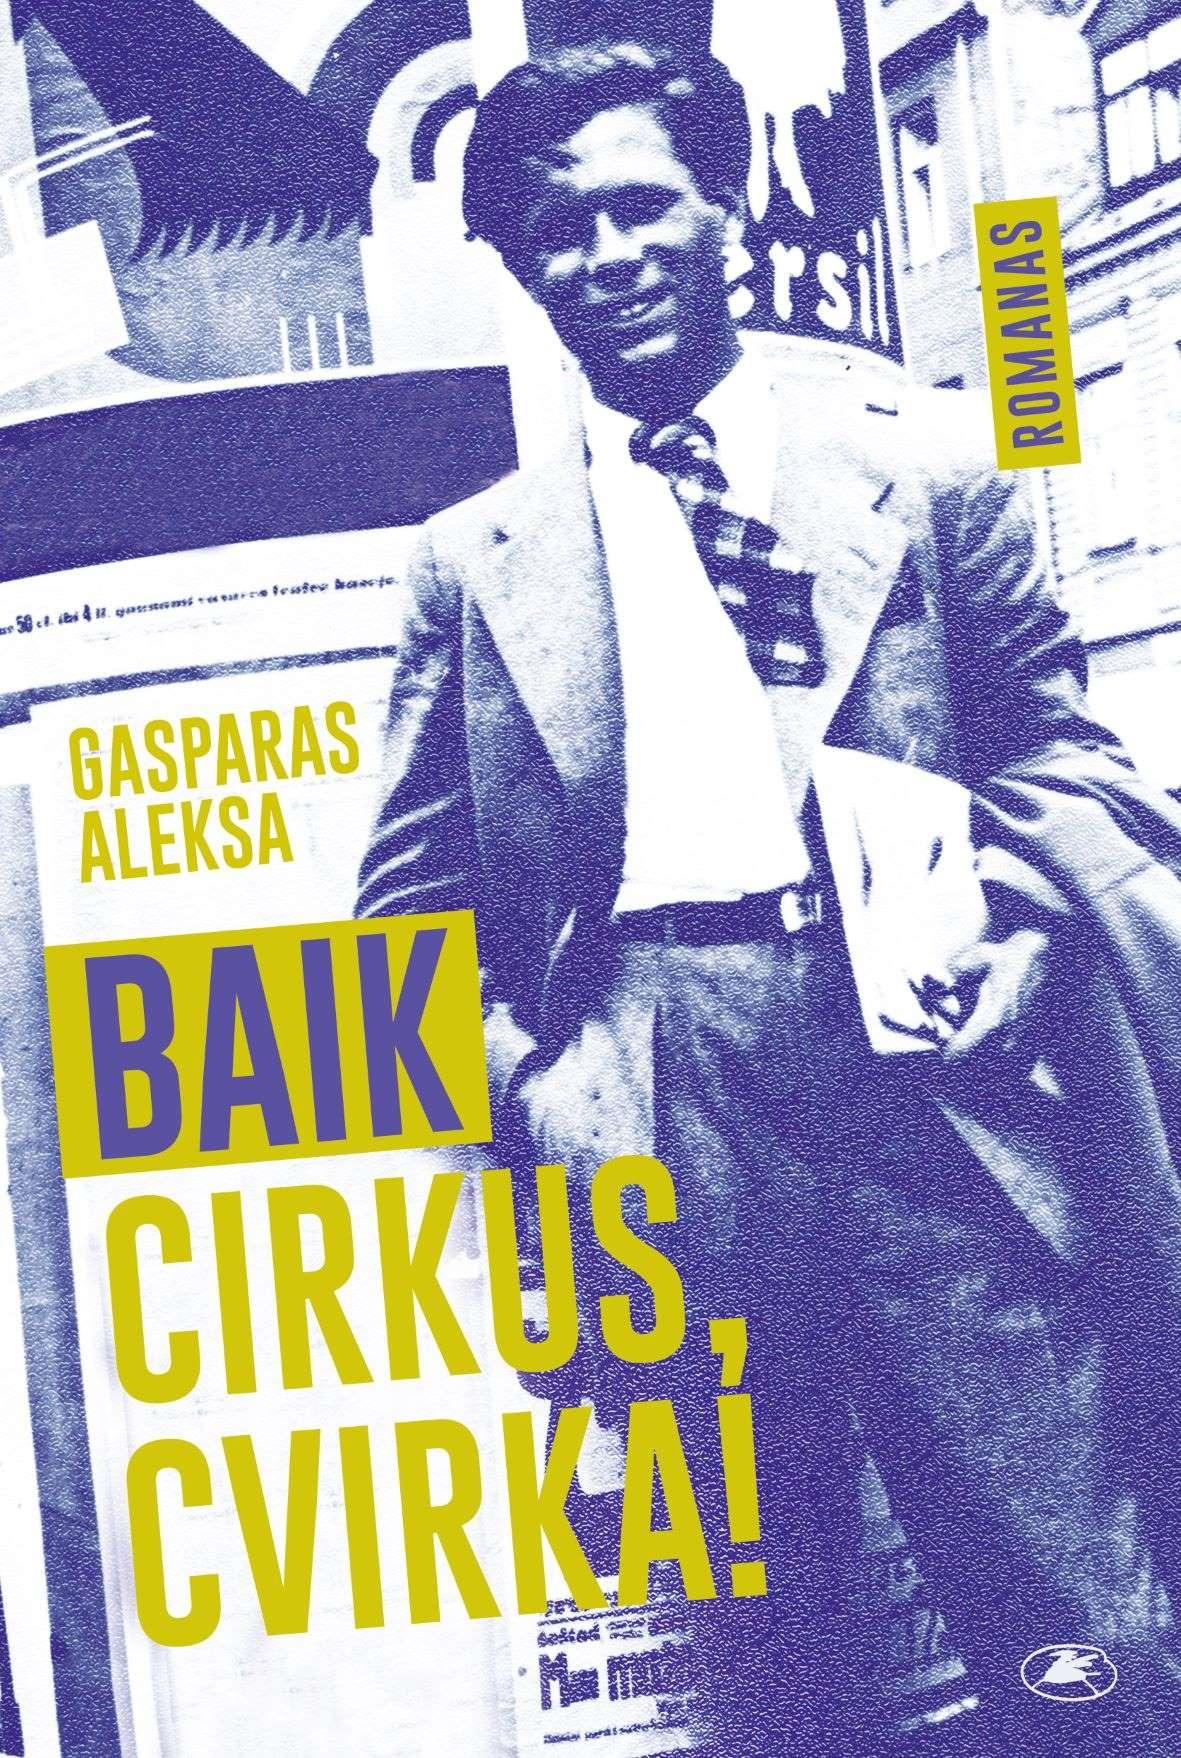 "Gasparas Aleksa. ""Baik cirkus, Cvirka!"" (Vilnius: Lietuvos rašytojų sąjungos leidykla, 2021)"